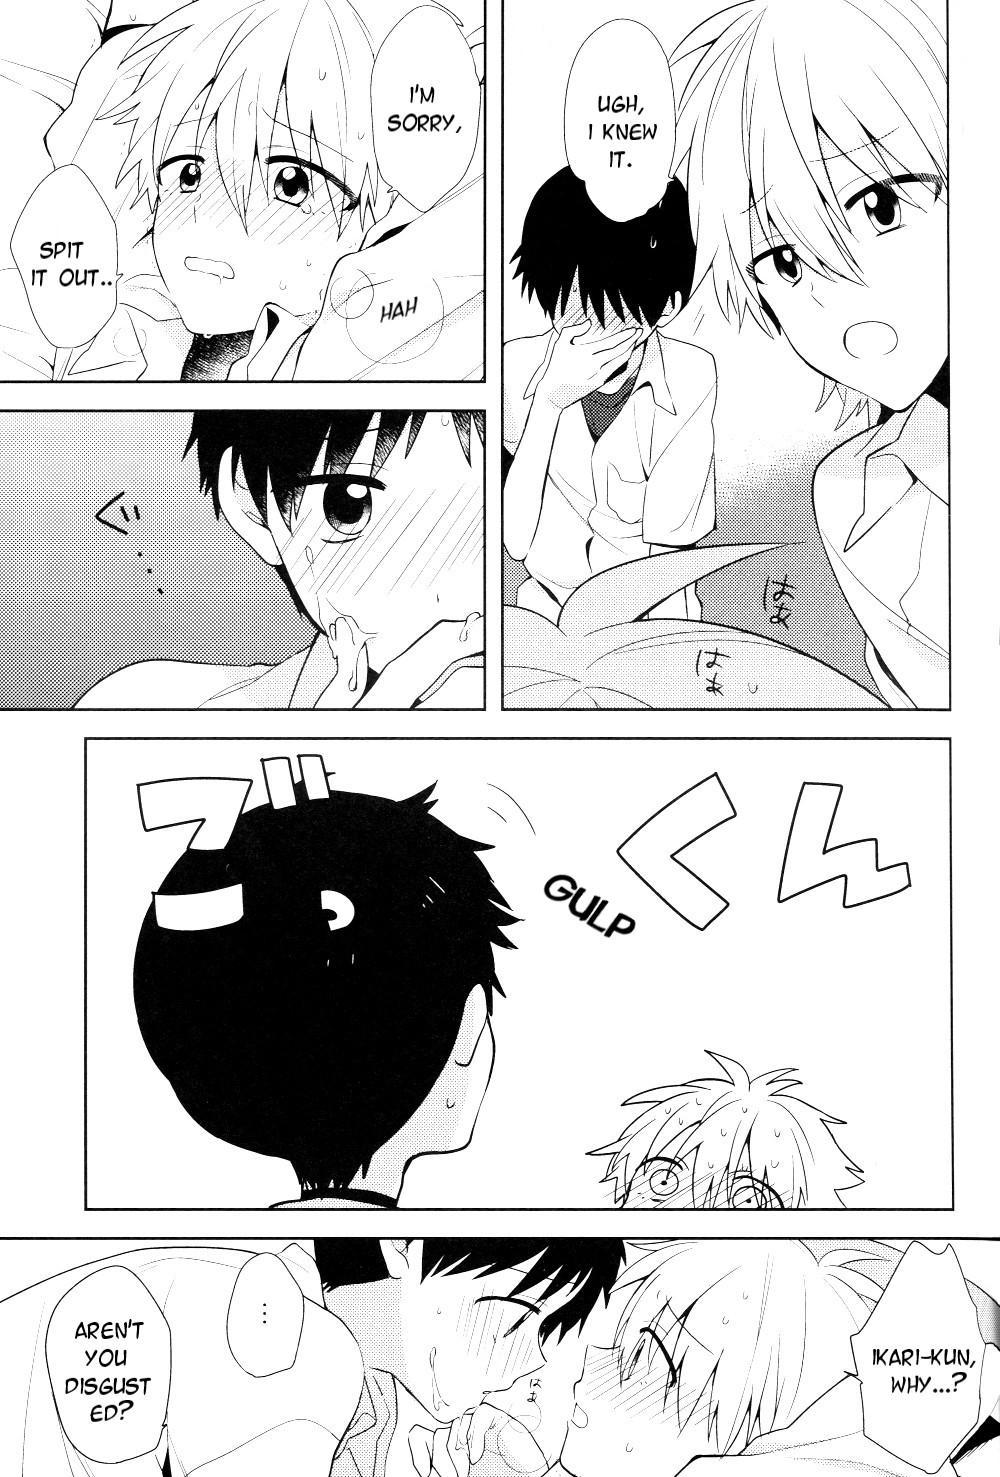 (HaruCC19) [Nicomarch (Plico)] Nagisa-kun no Iu Toori | As Nagisa-kun Commands (Neon Genesis Evangelion) [English] [TyroLuuki] 10